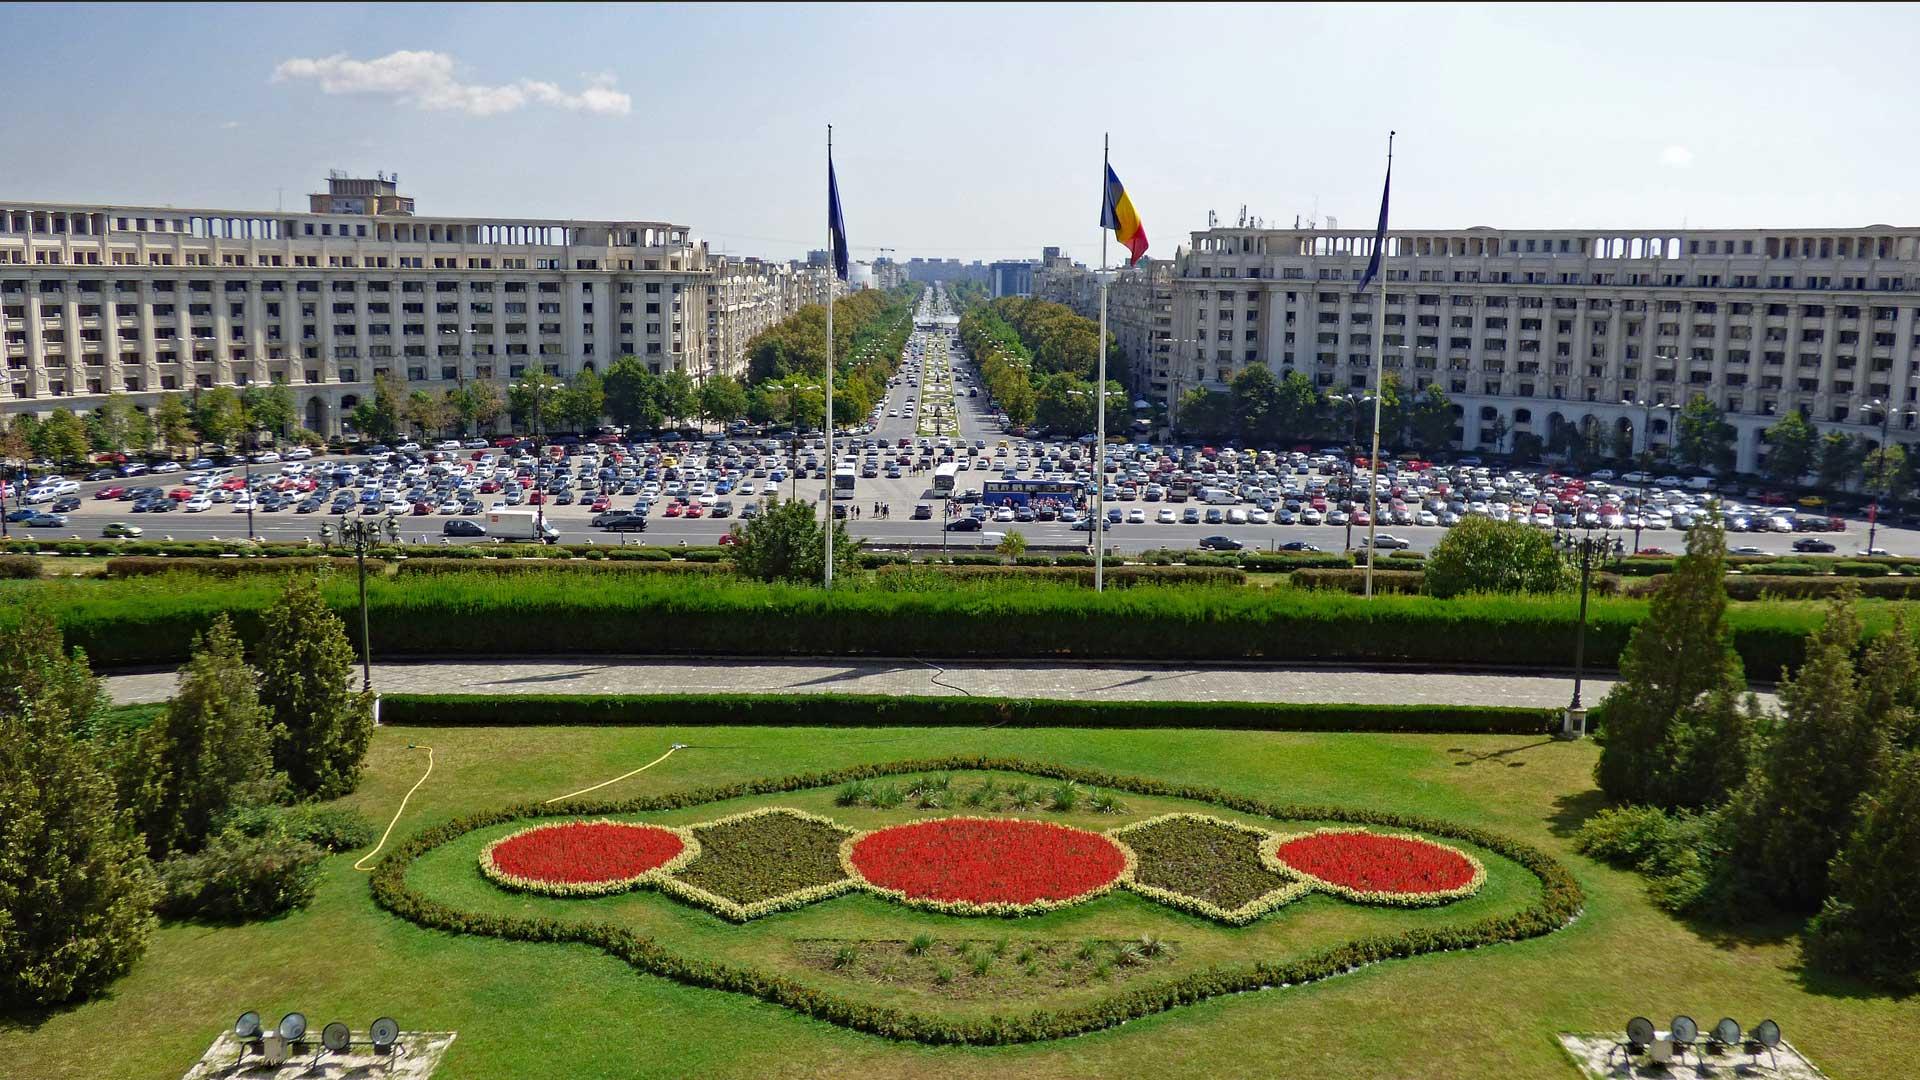 bucharest-main-square